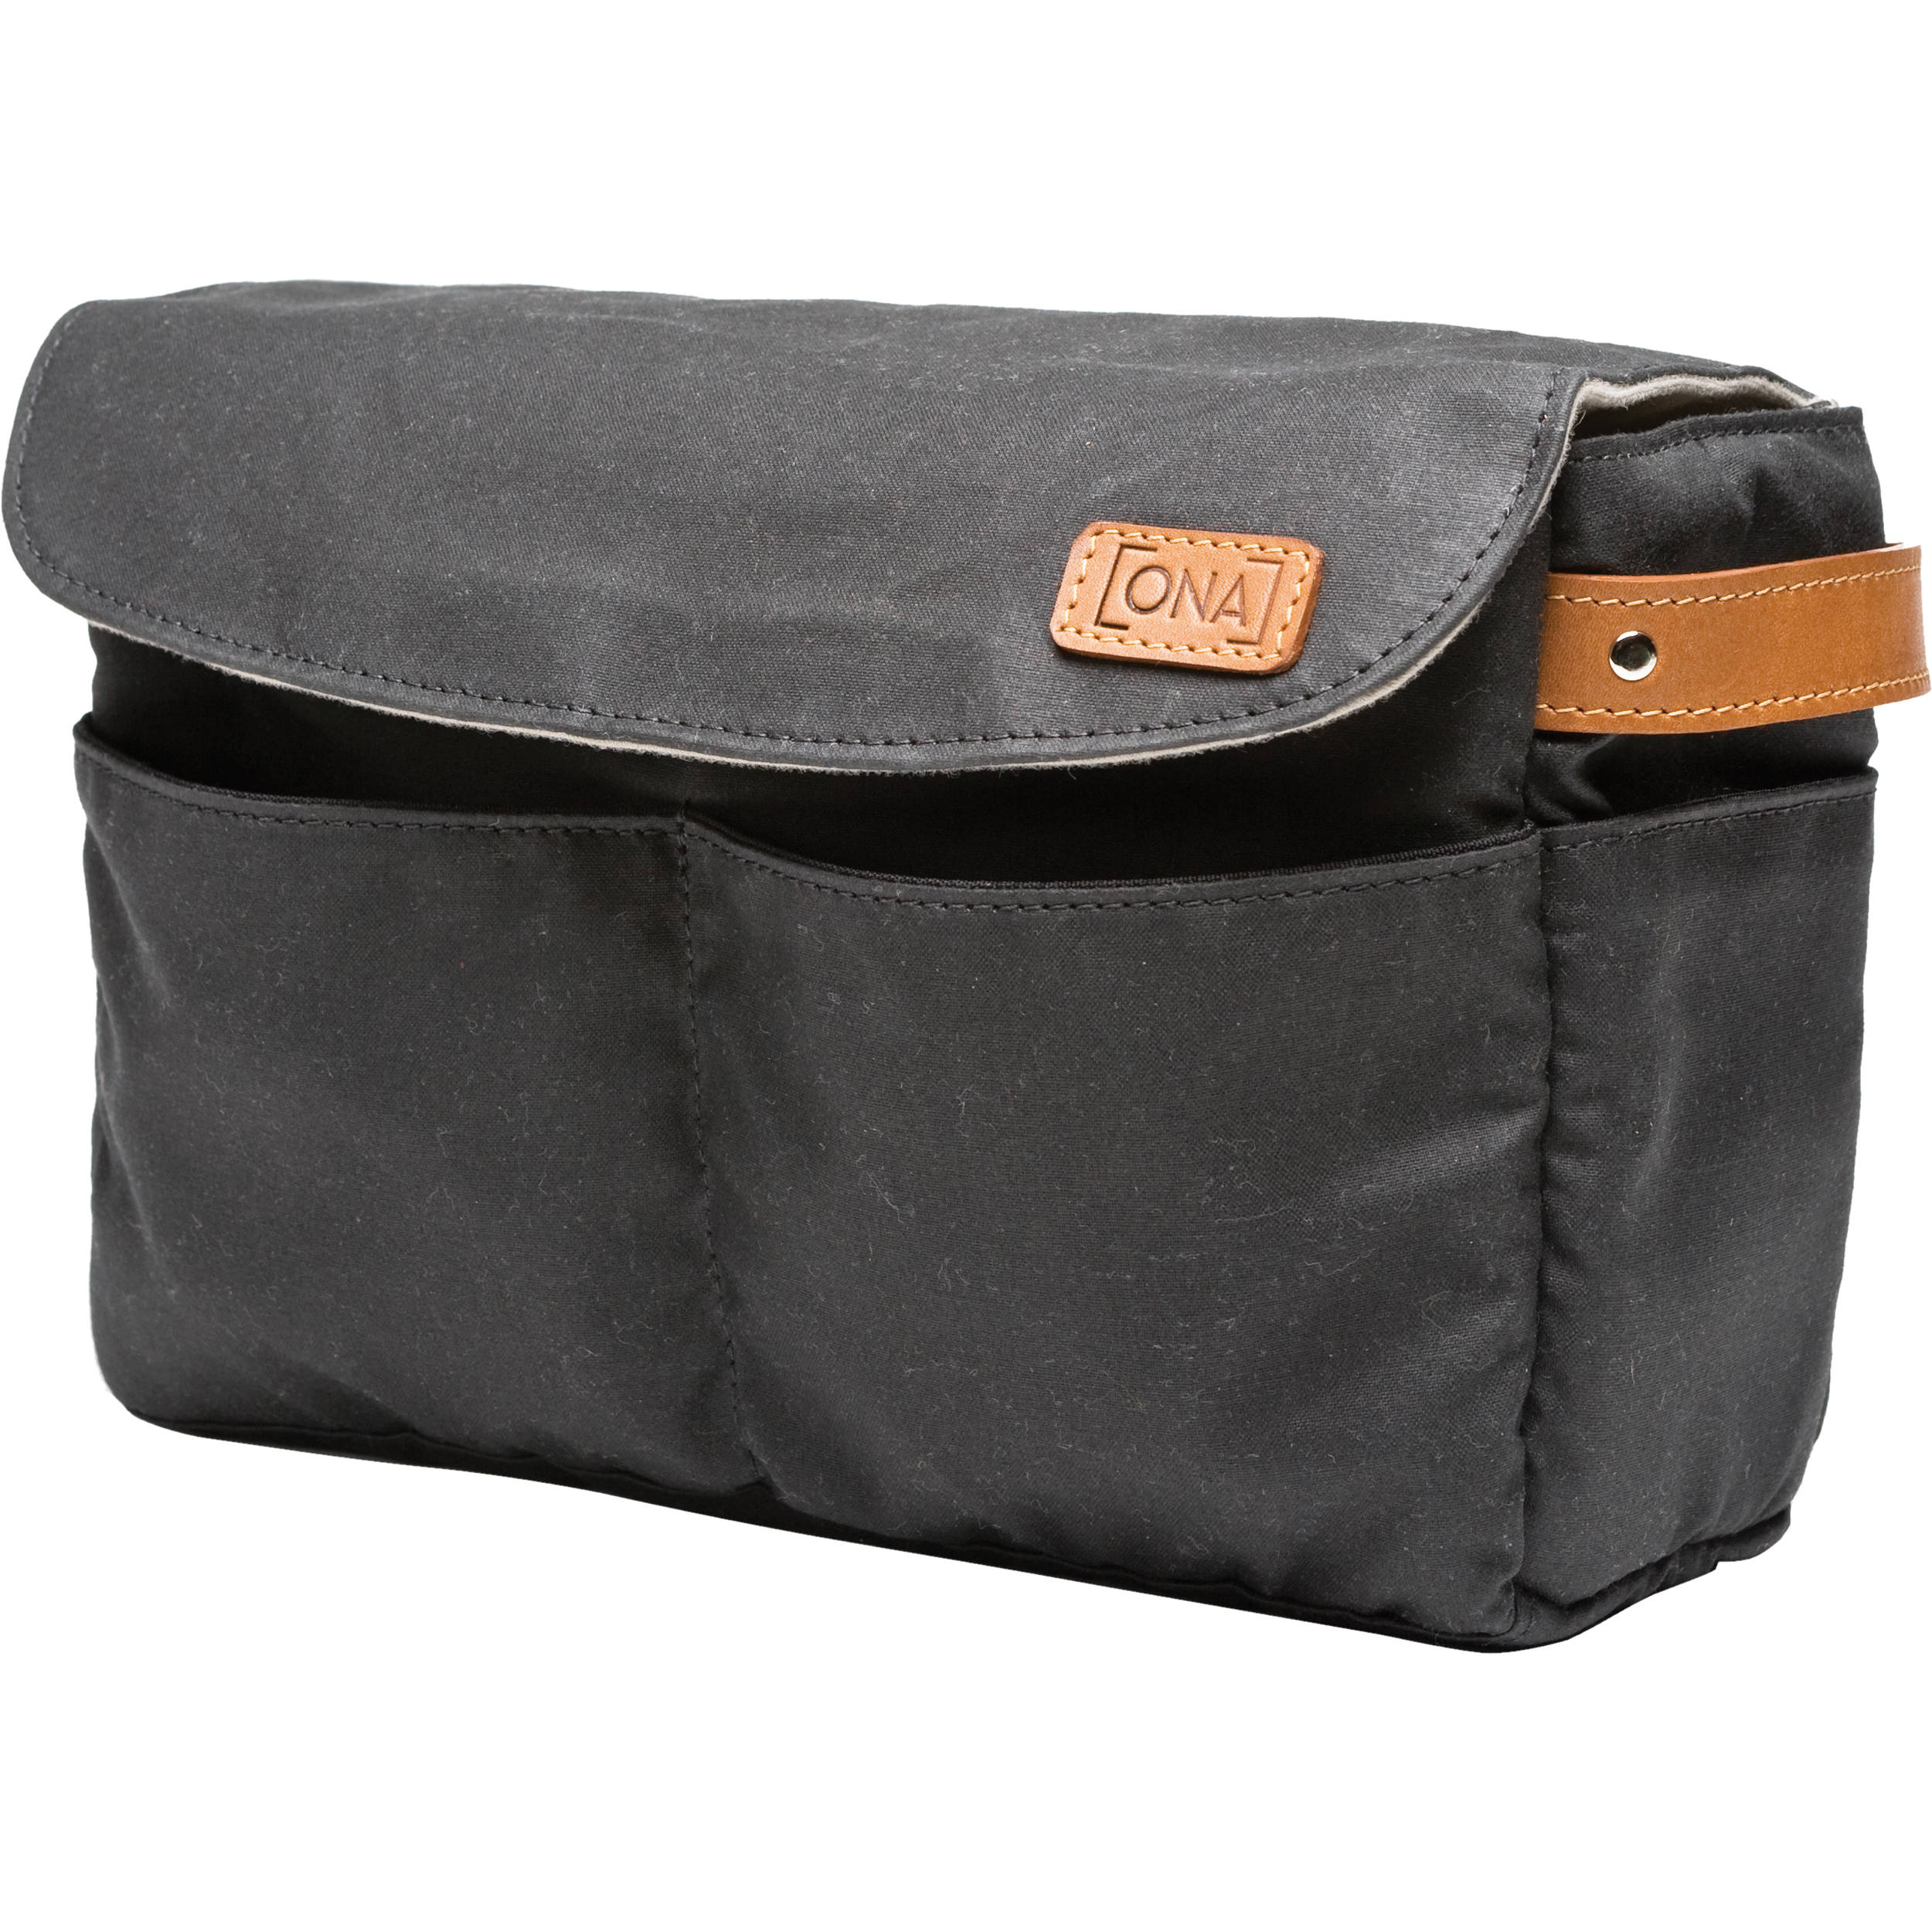 Tenba Bag Organiser